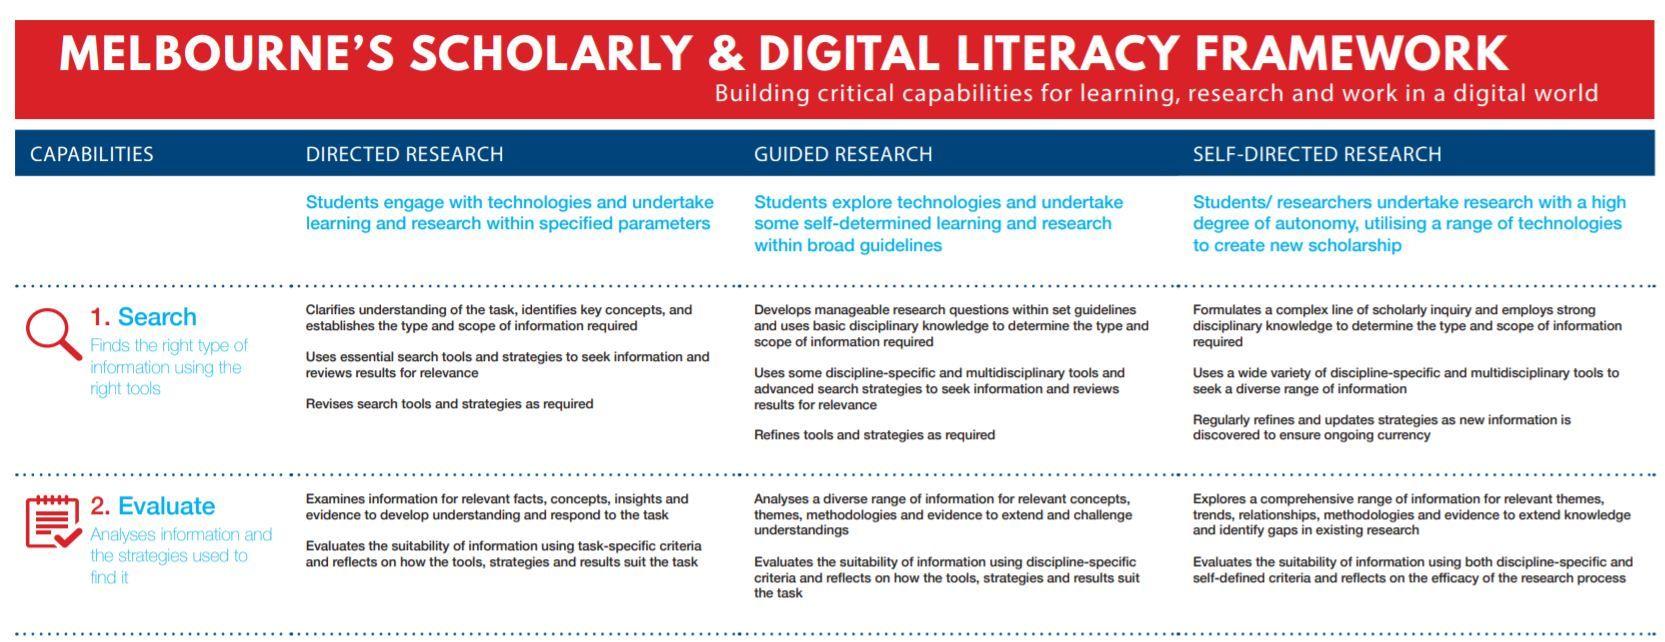 Scholarly and Digital Literacy Framework Digital